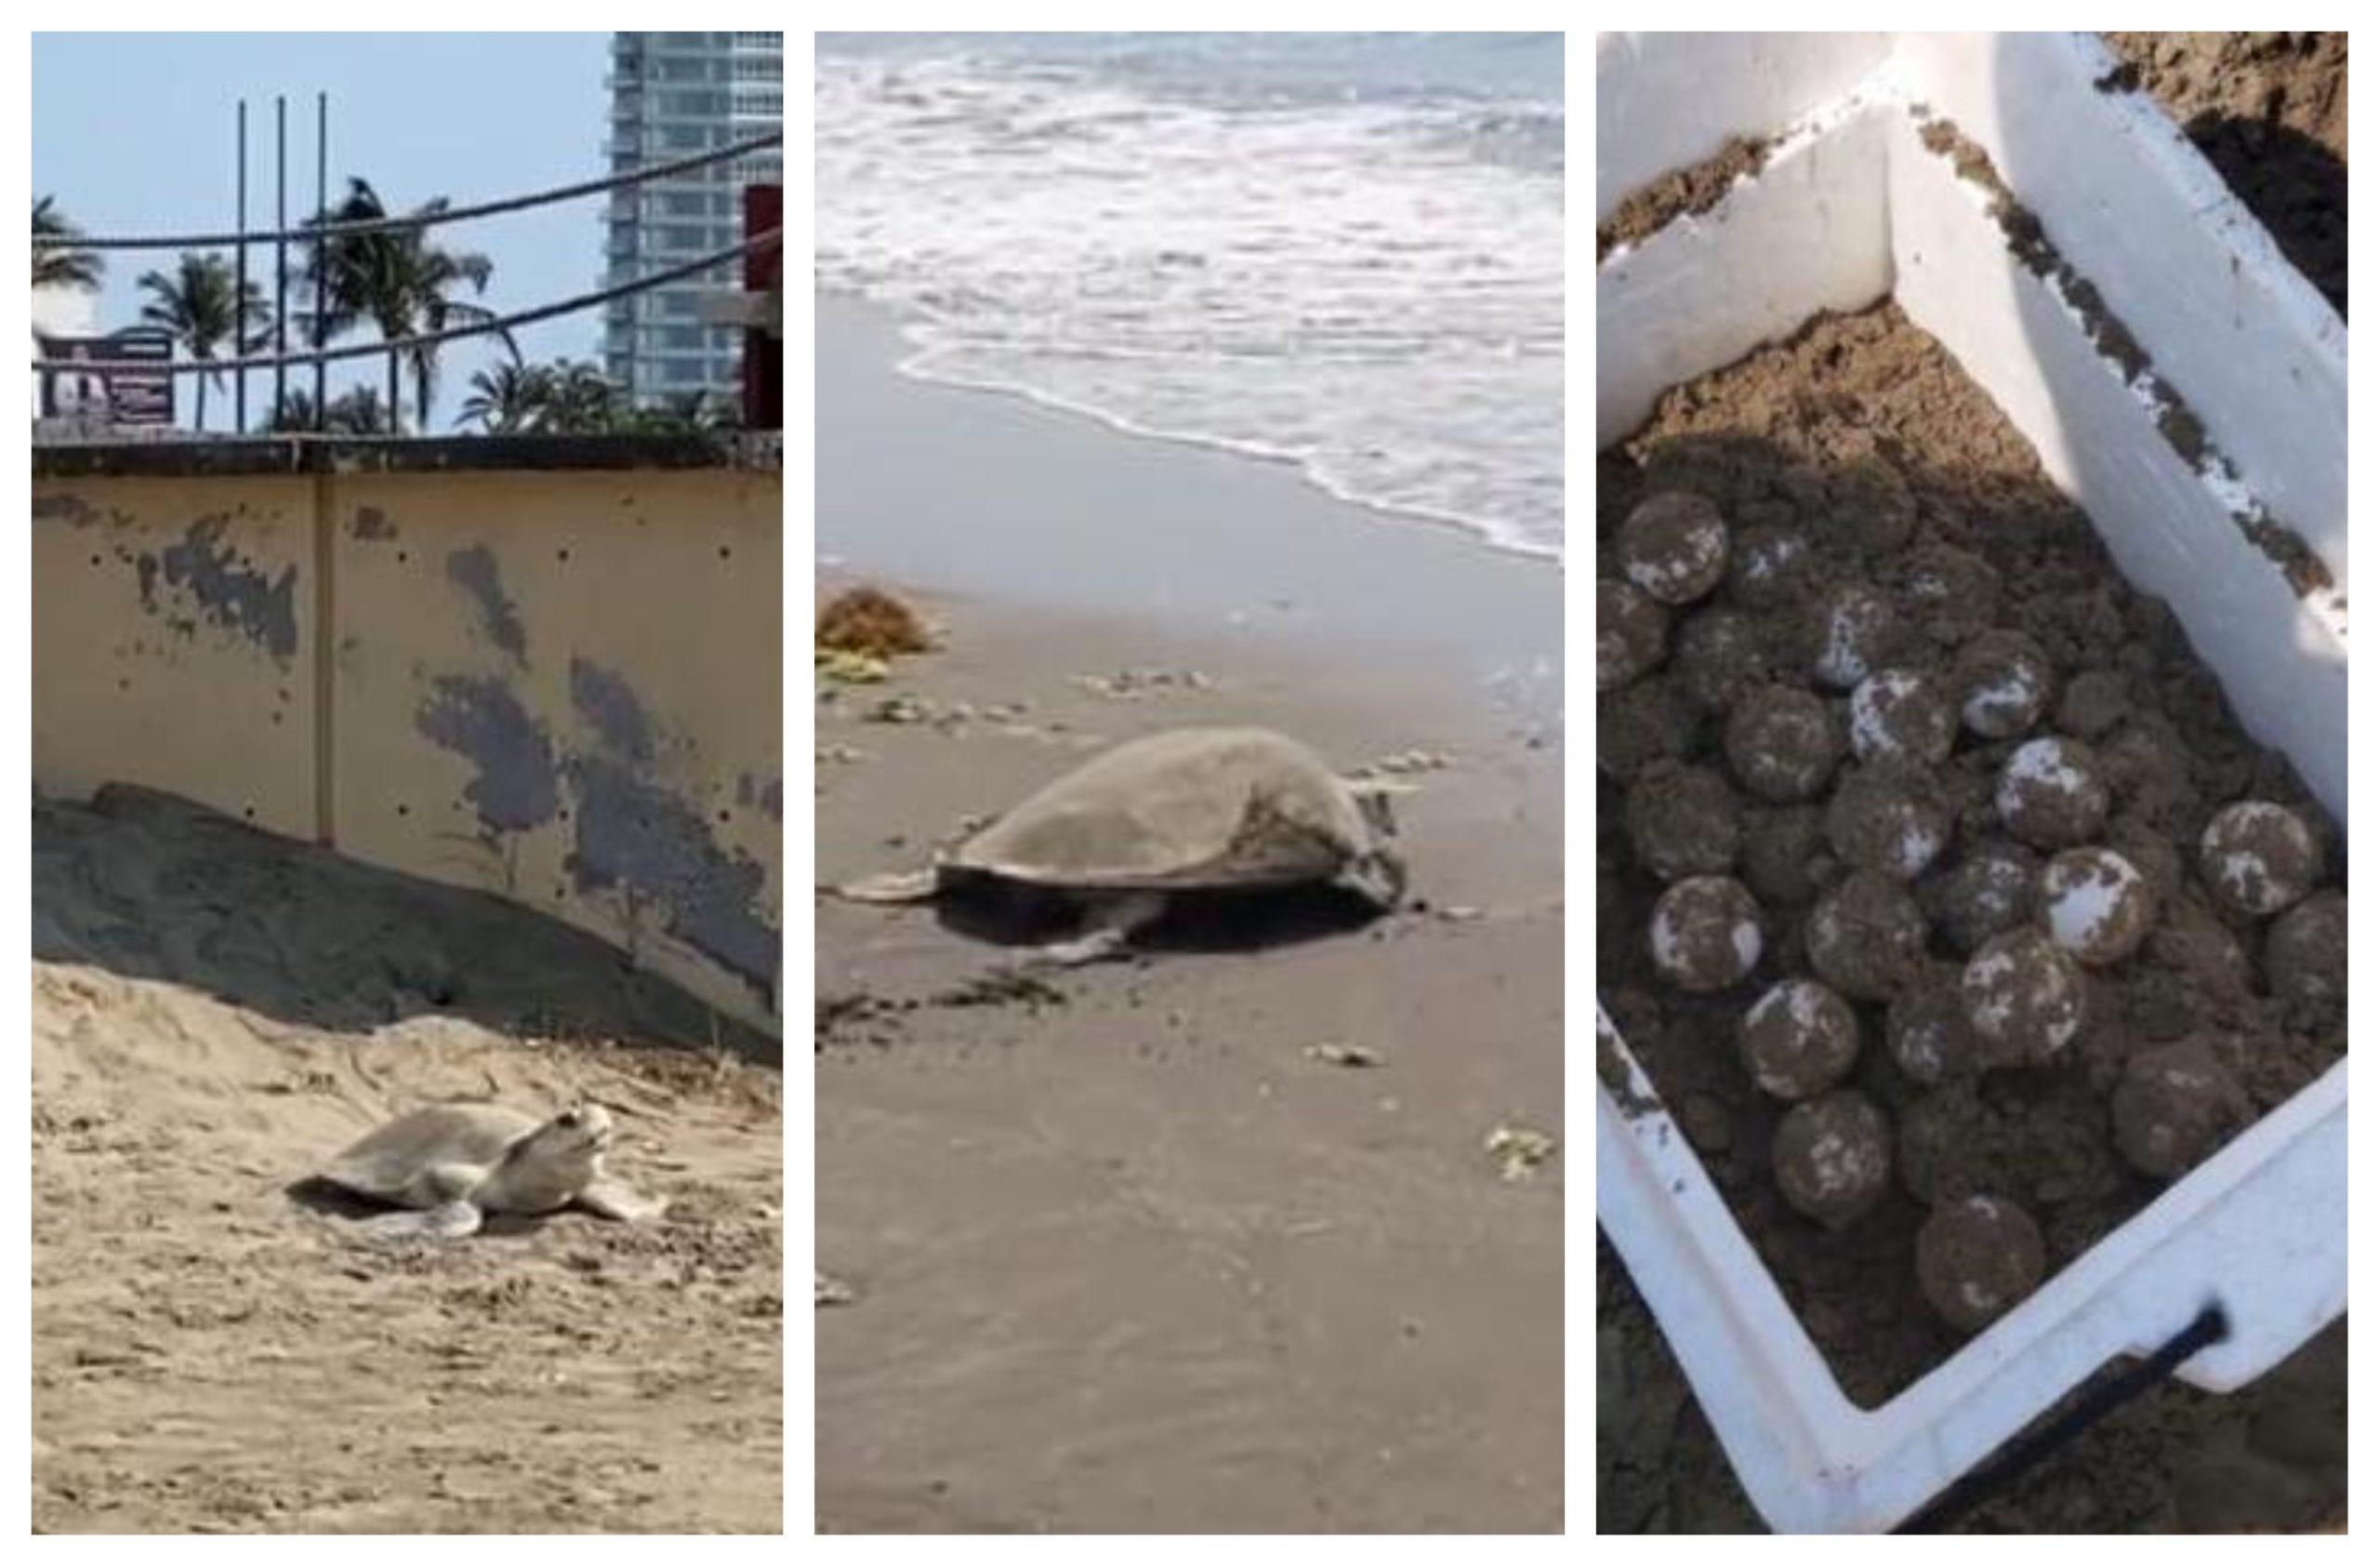 Tortuga marina depositó 92 huevos en playa Pelícanos de Boca del Río